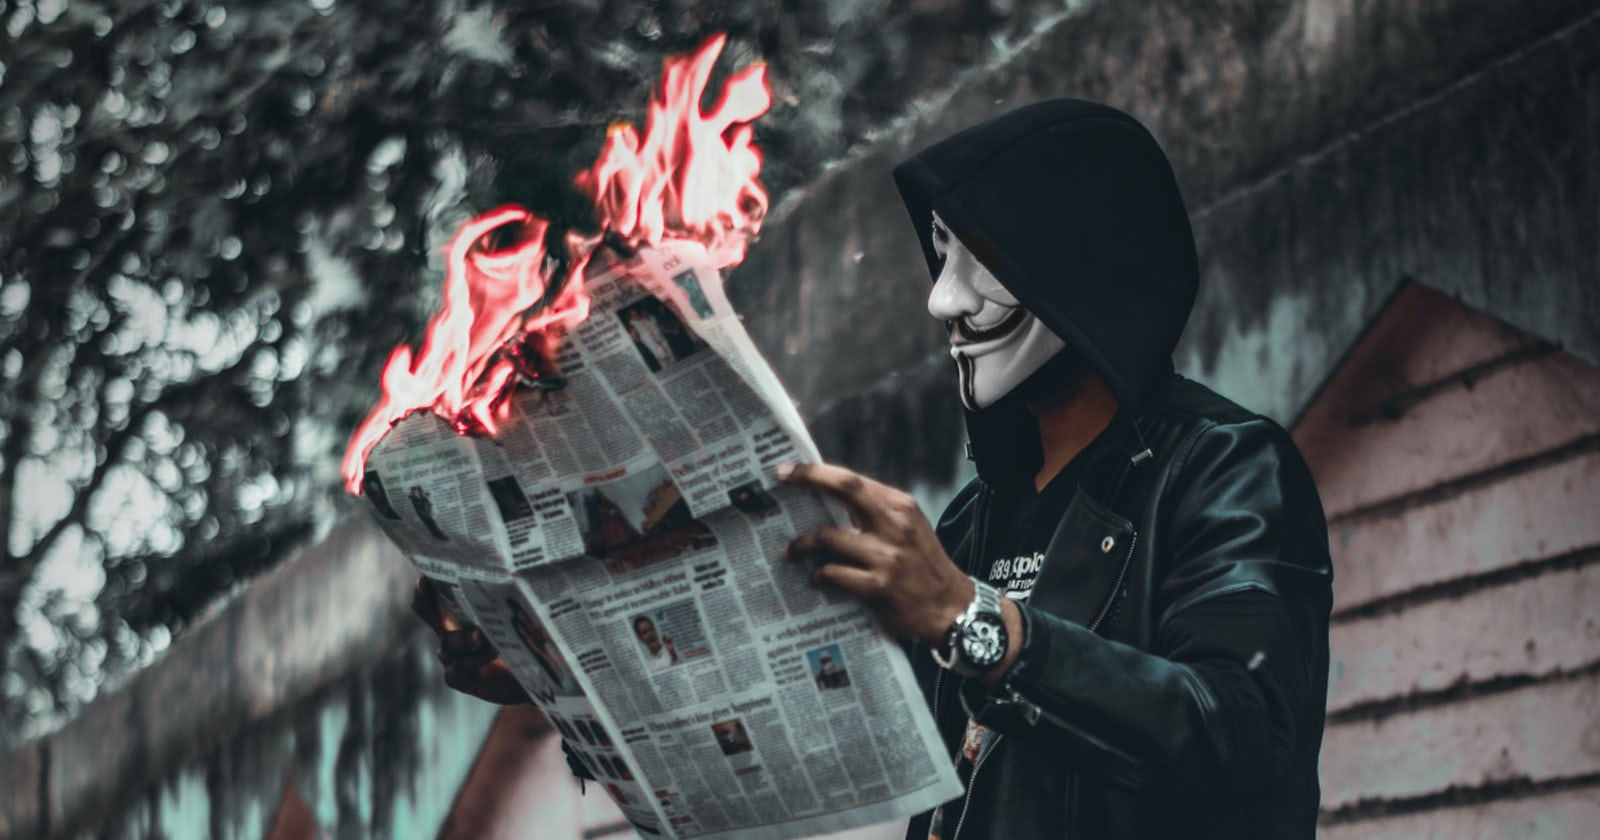 How One Guy Ruined #Hacktoberfest2020